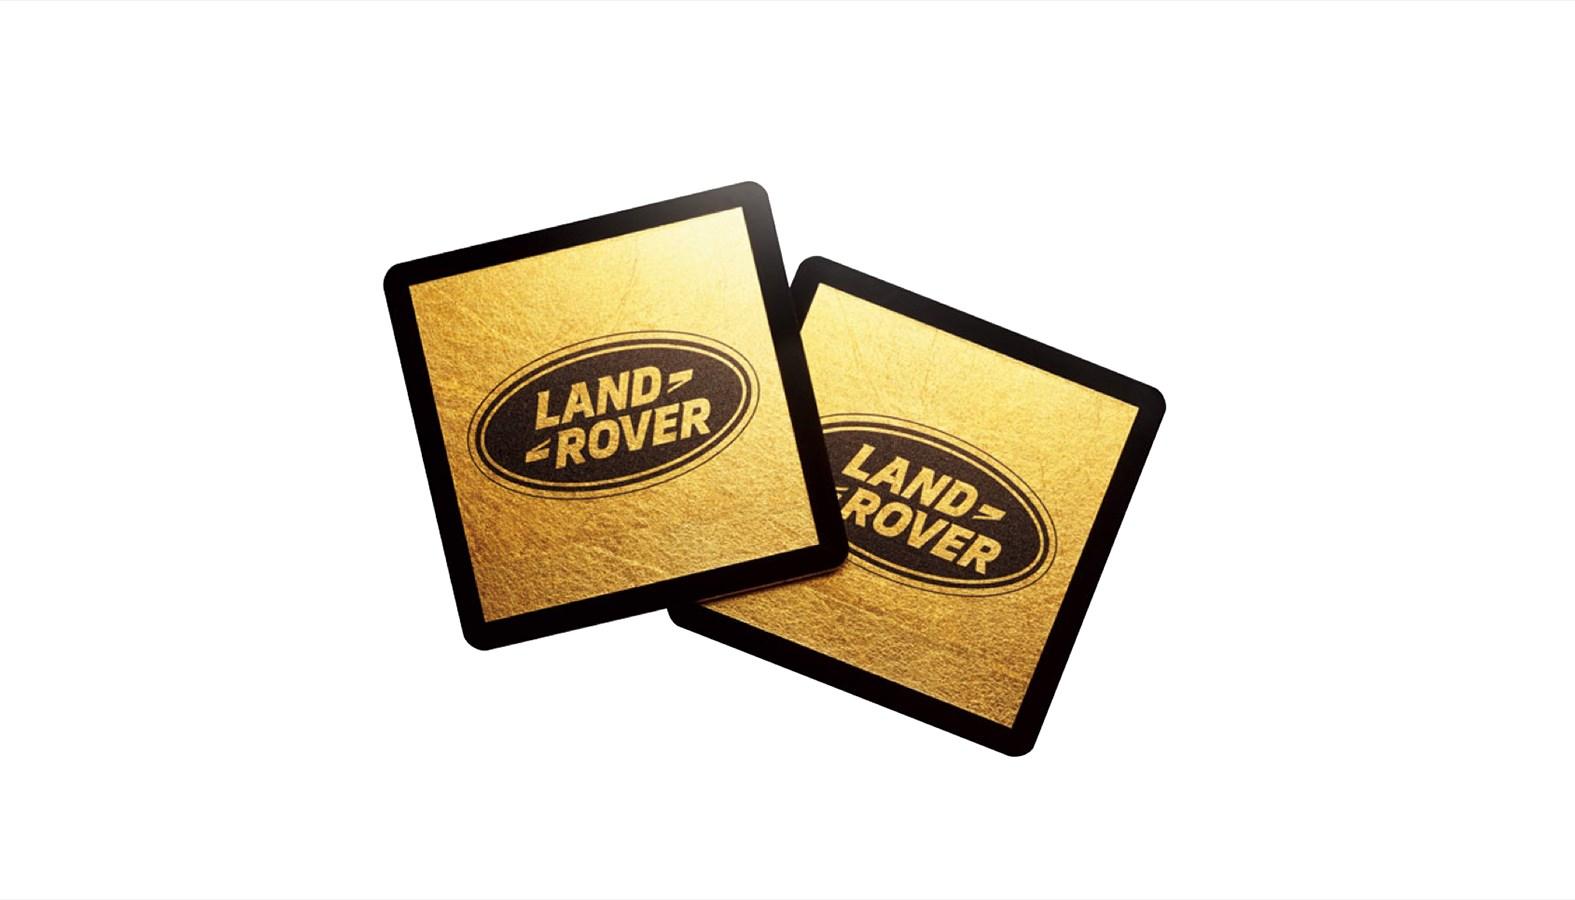 170106landrover_new-year-fair-selection3